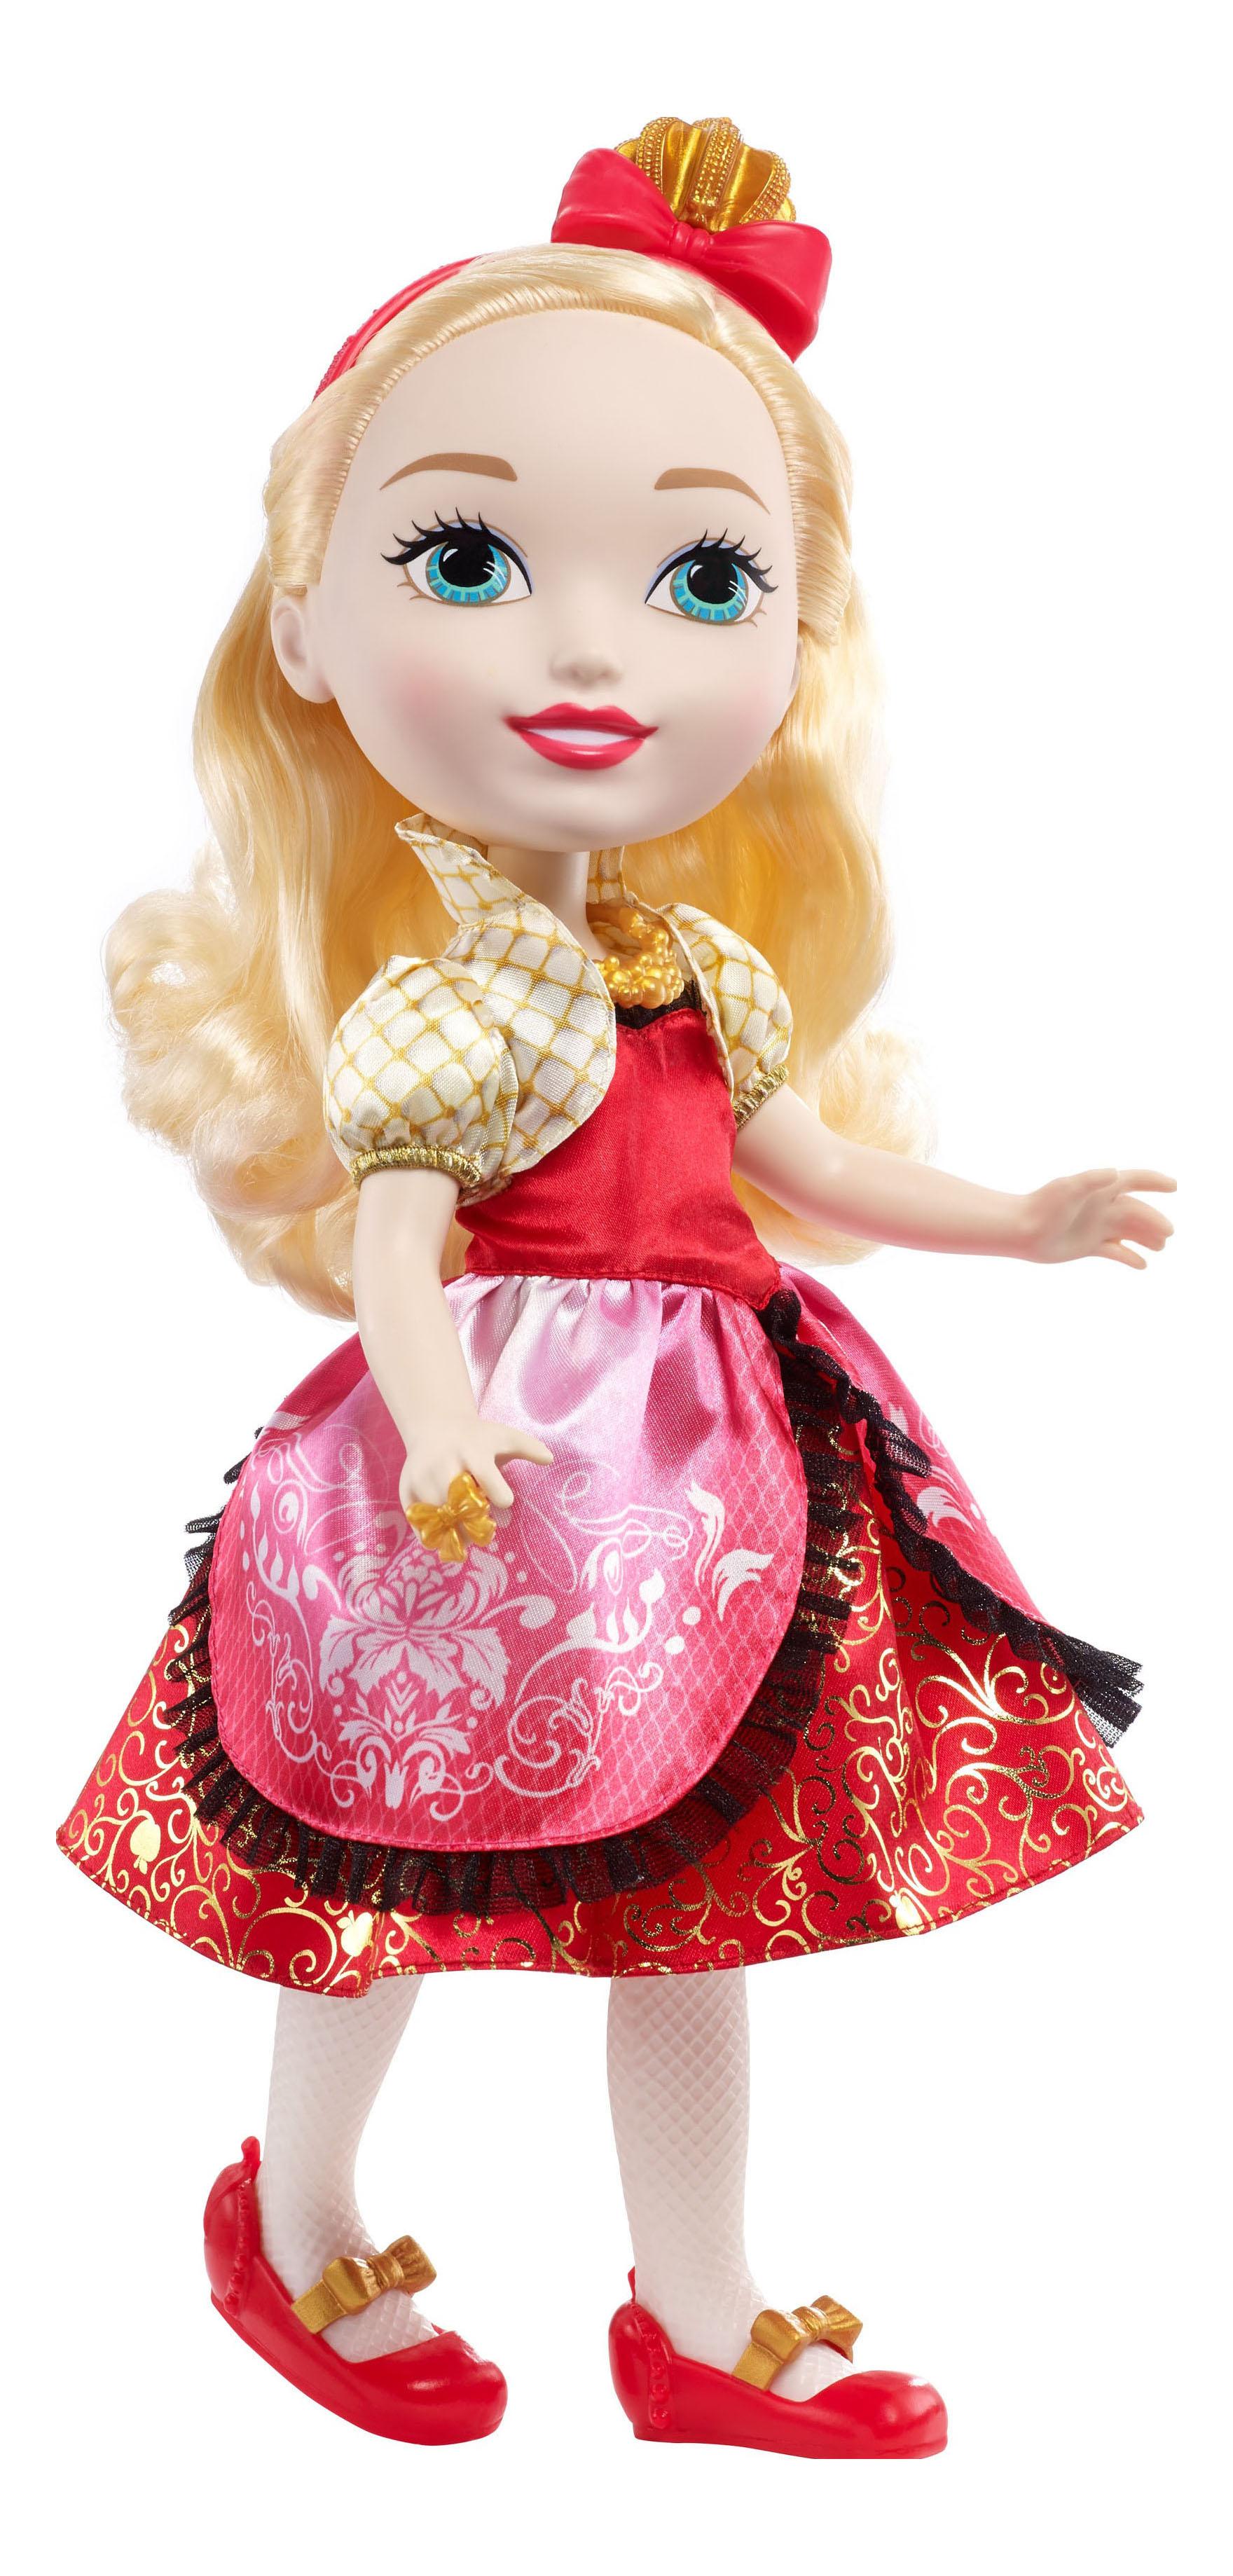 Кукла Ever After High Эппл Уайт DVJ22